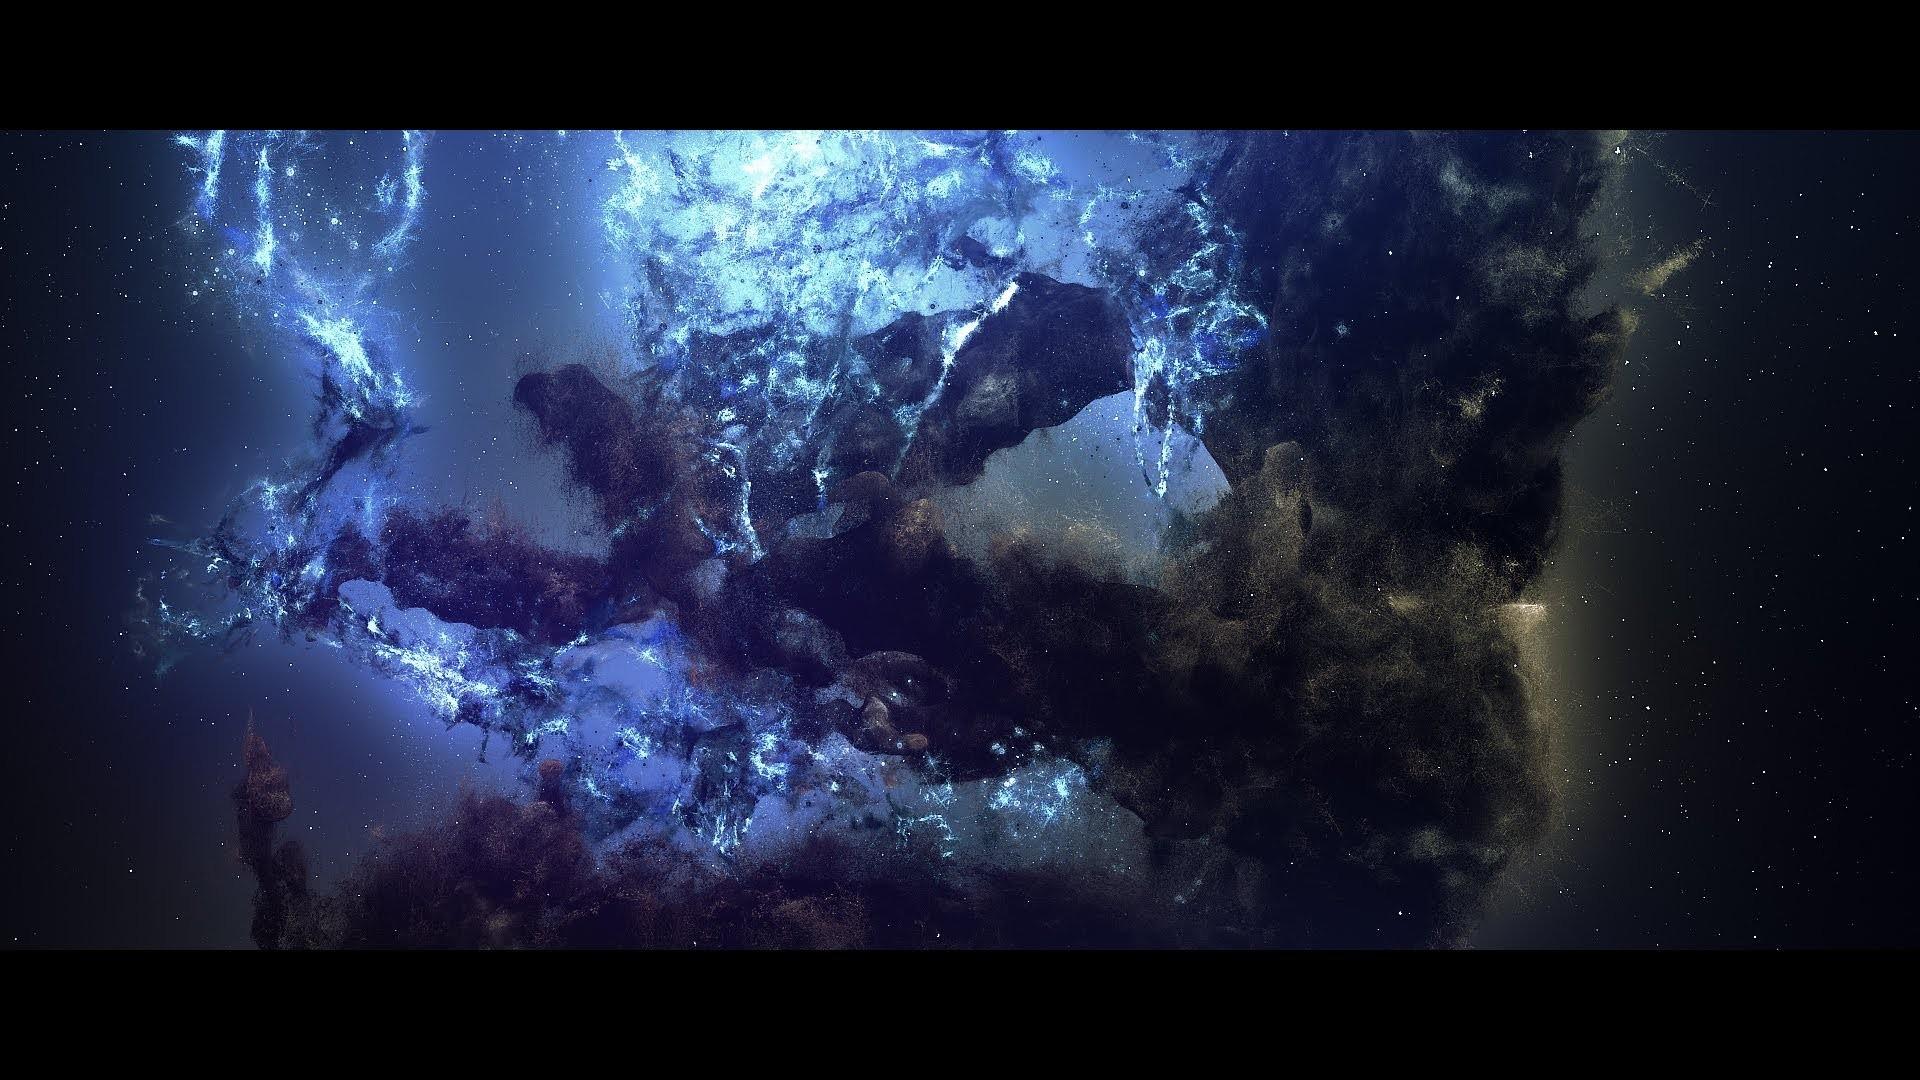 FREE Wallpapers: https://www.matthiasm.de/HDvideos/TSWLI_wallpapers